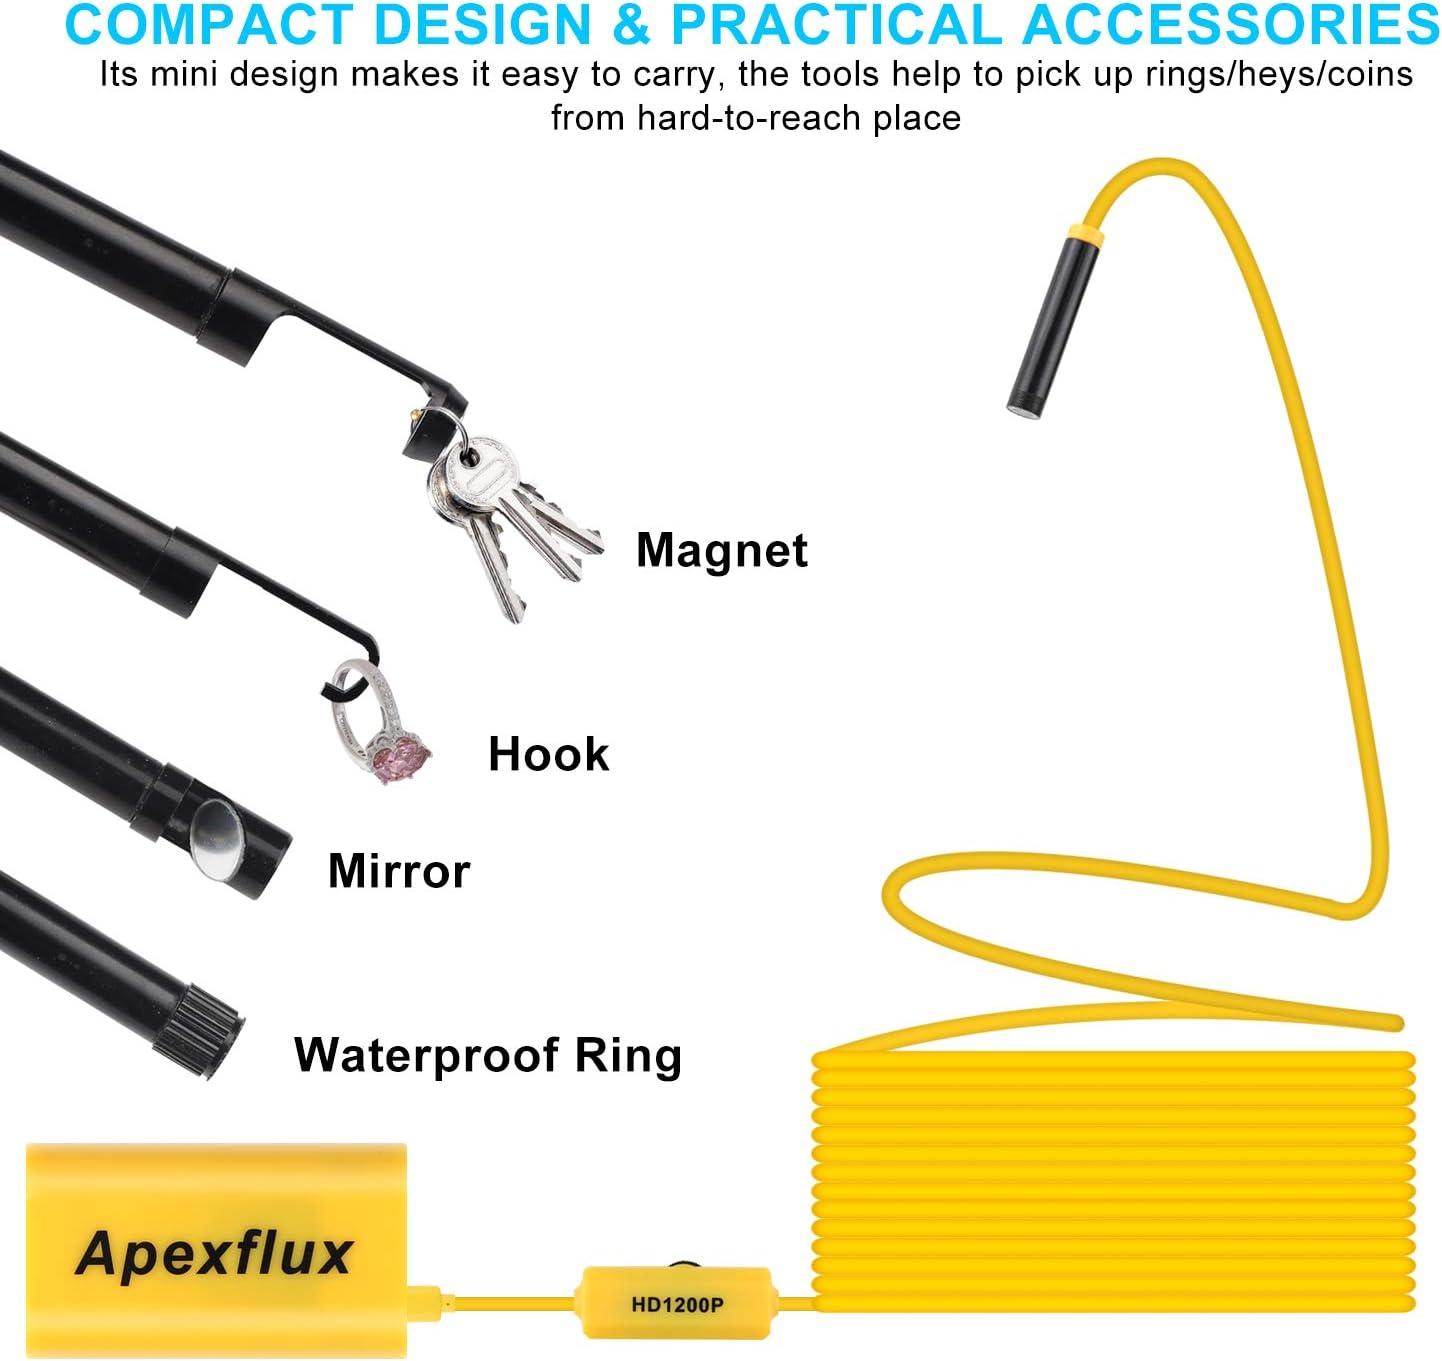 Apexflux Cámara endoscópica WiFi, cámara de inspección boroscópica inalámbrica, cámara de Serpiente de Alta resolución Ajustable con Cables semirrígidos para Smartphone/PC/Tablet (Amarillo, 5 m): Amazon.es: Electrónica